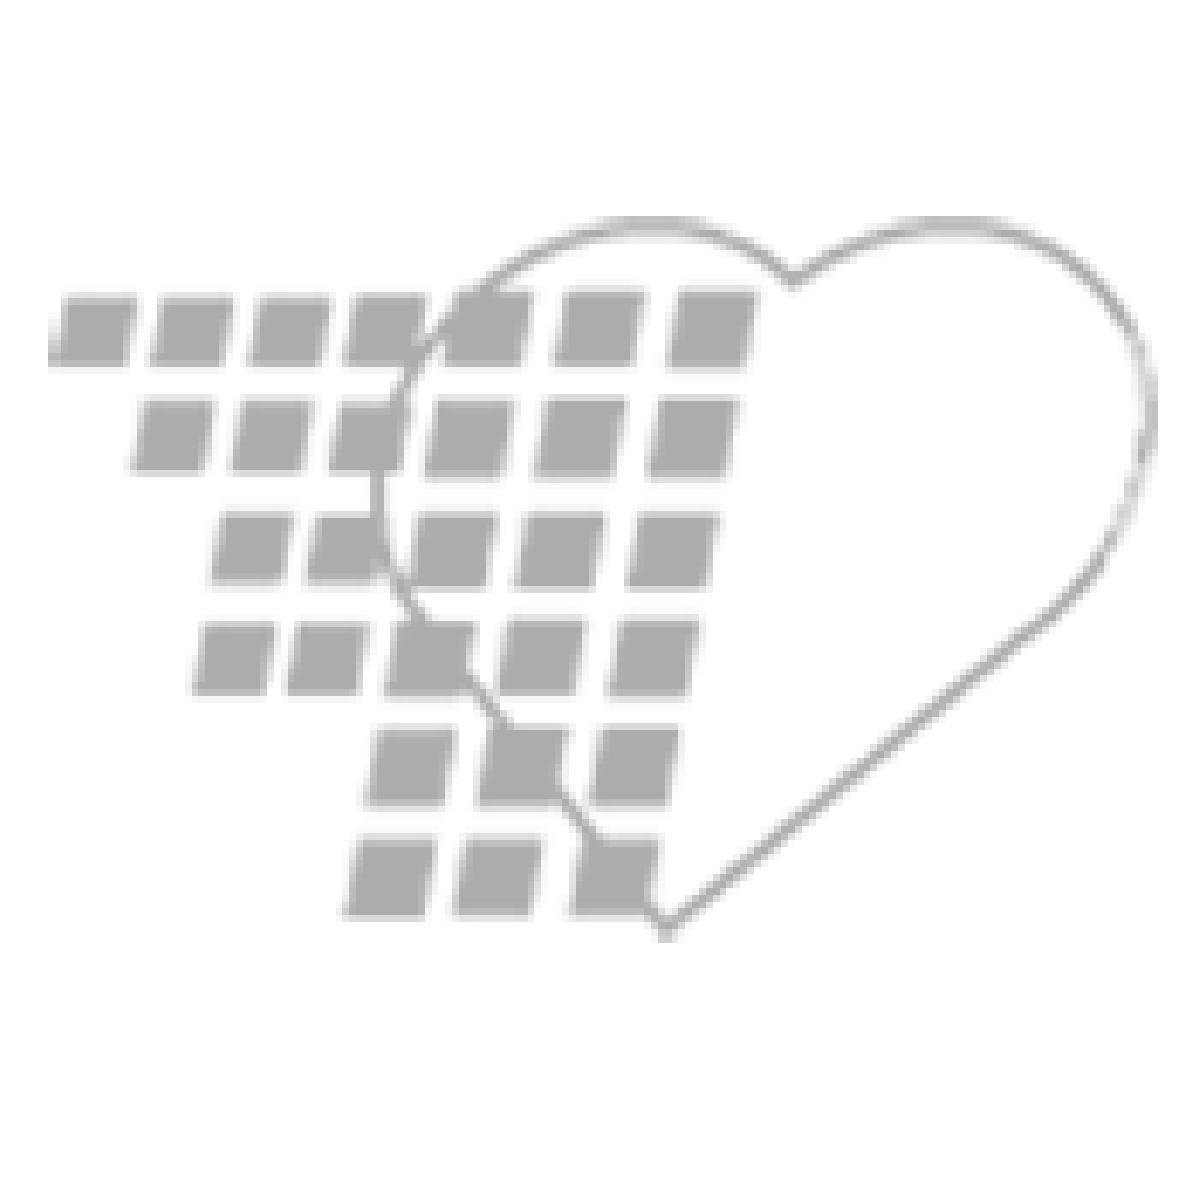 08-02-1424 Povidone Iodine Scrub Solution